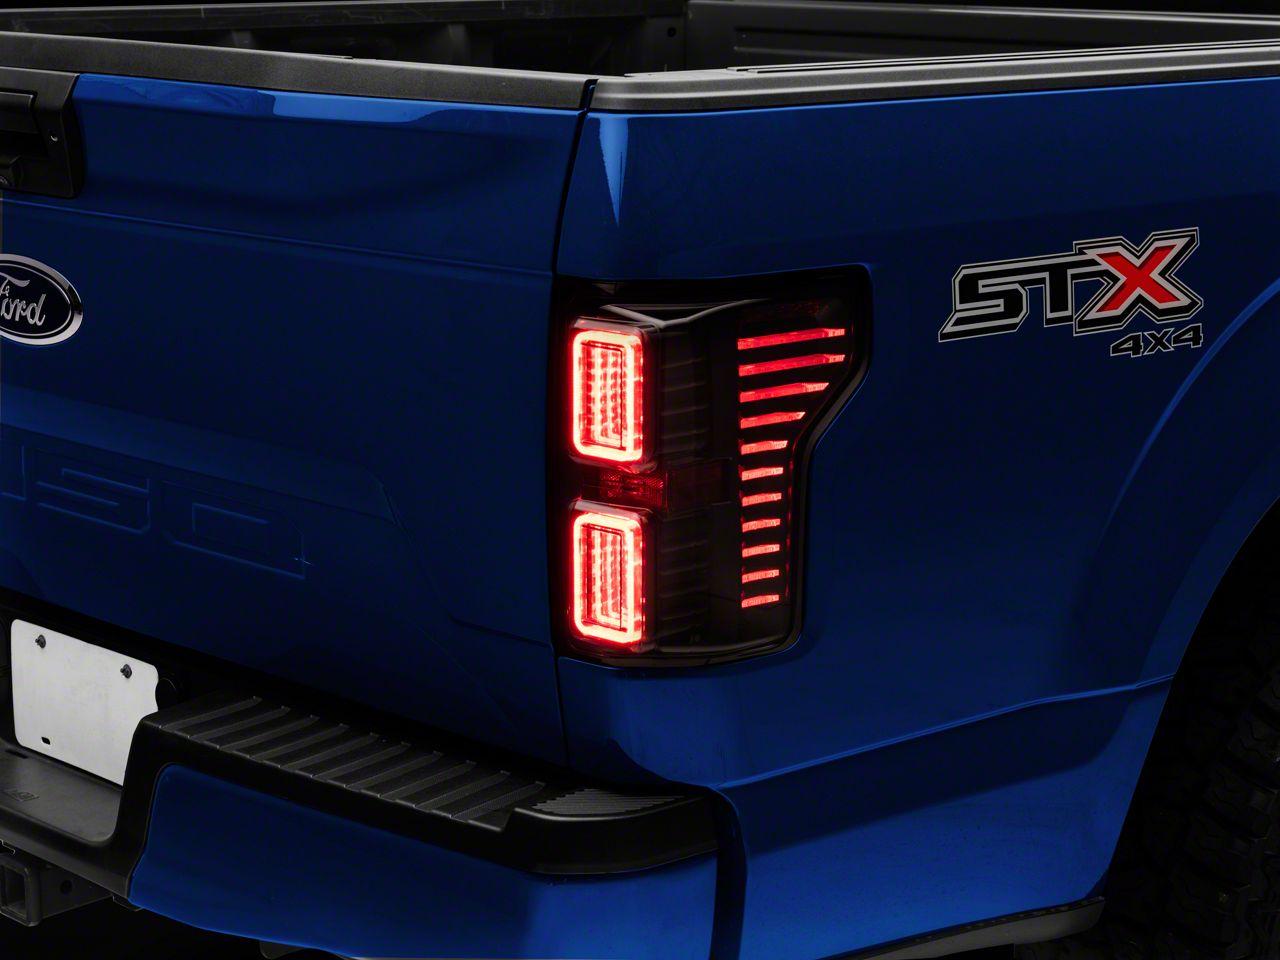 Morimoto XB LED Tail Lights - Smoked (18-19 F-150 w/o BLIS)